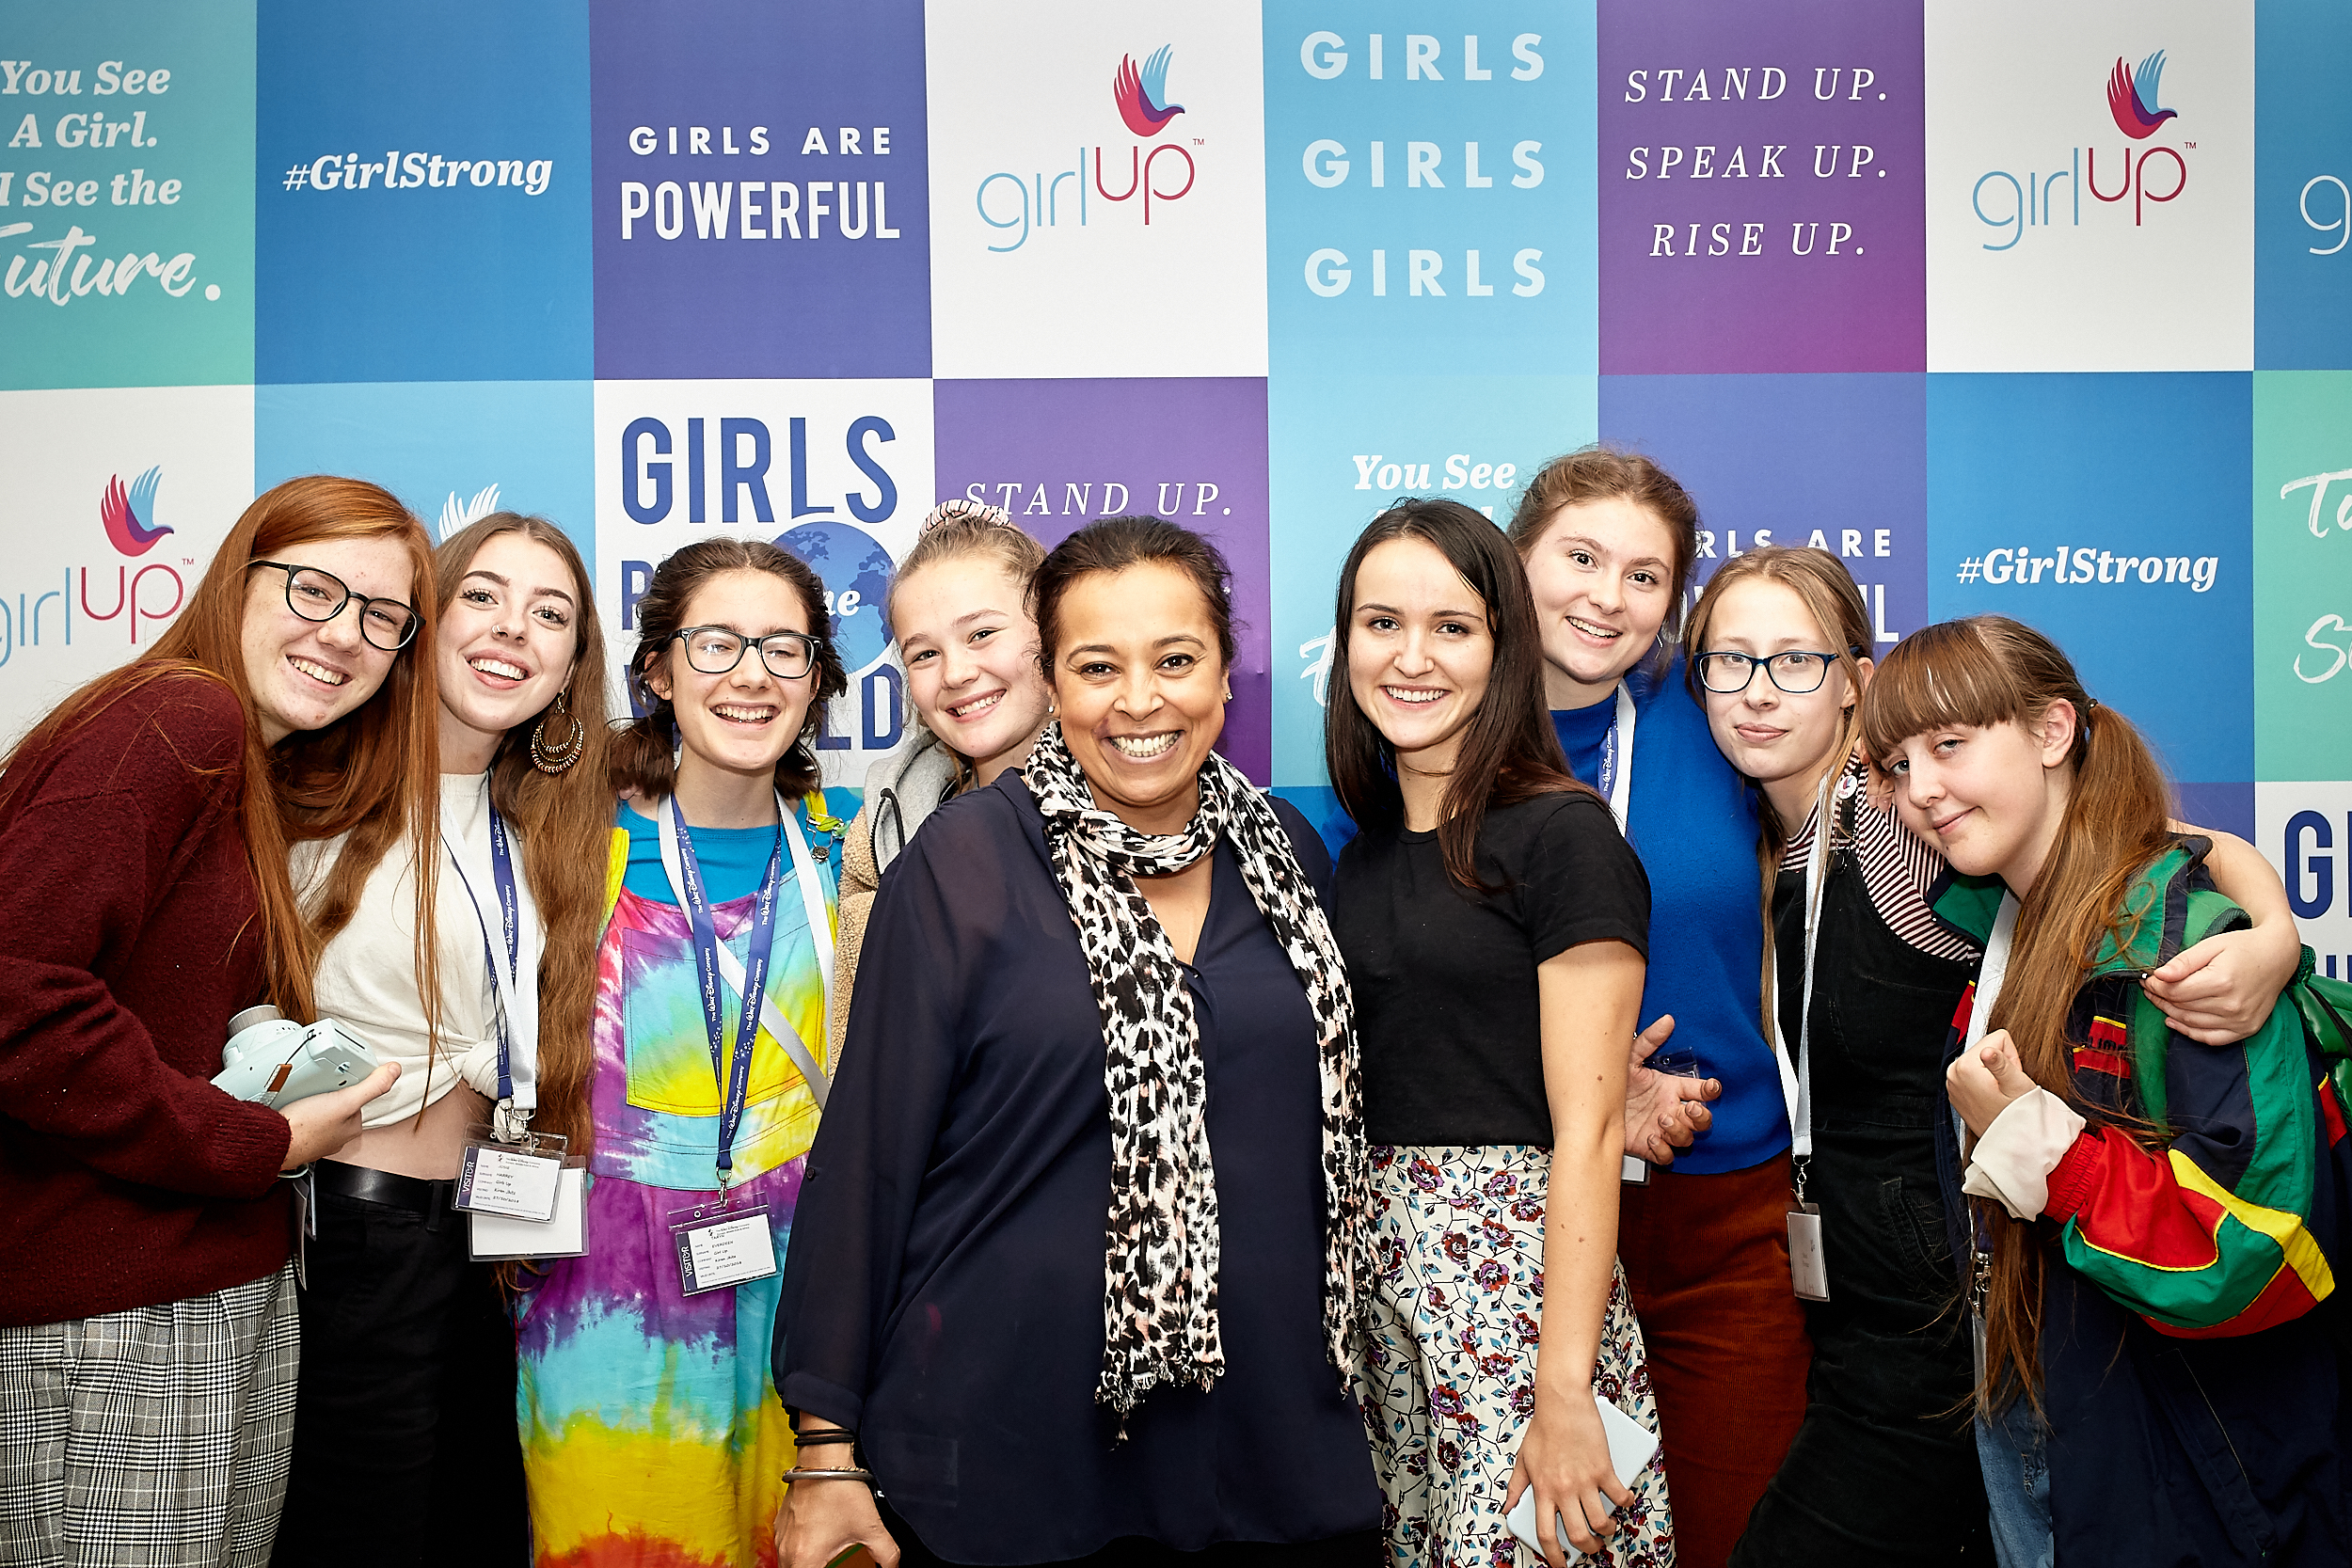 First UK Girl Up Leadership Summit Held in Disney's London Office